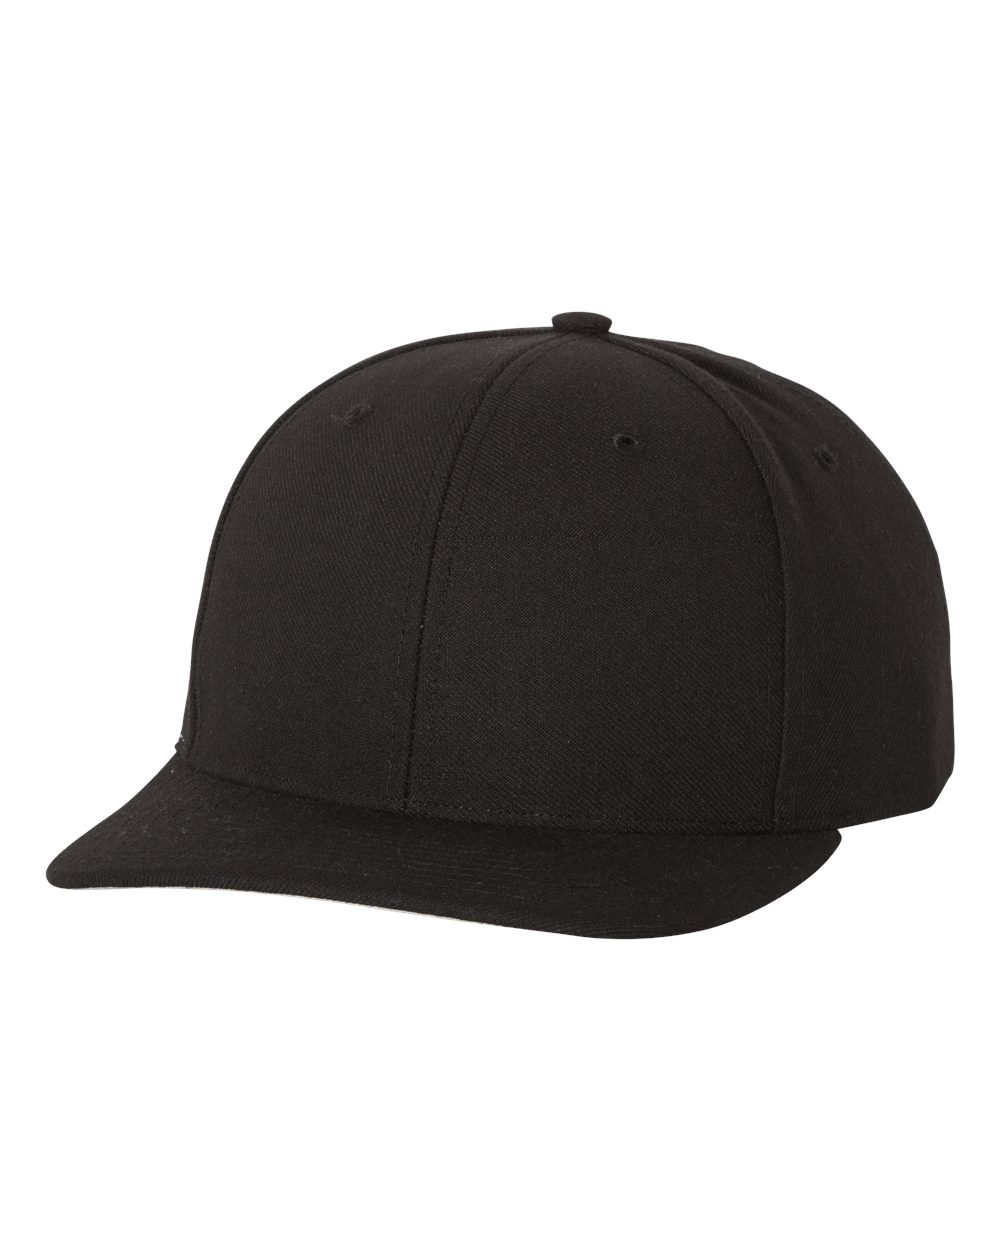 Richardson Washed Chino Baseball Cap Hat 320 M//L 24 Colors!